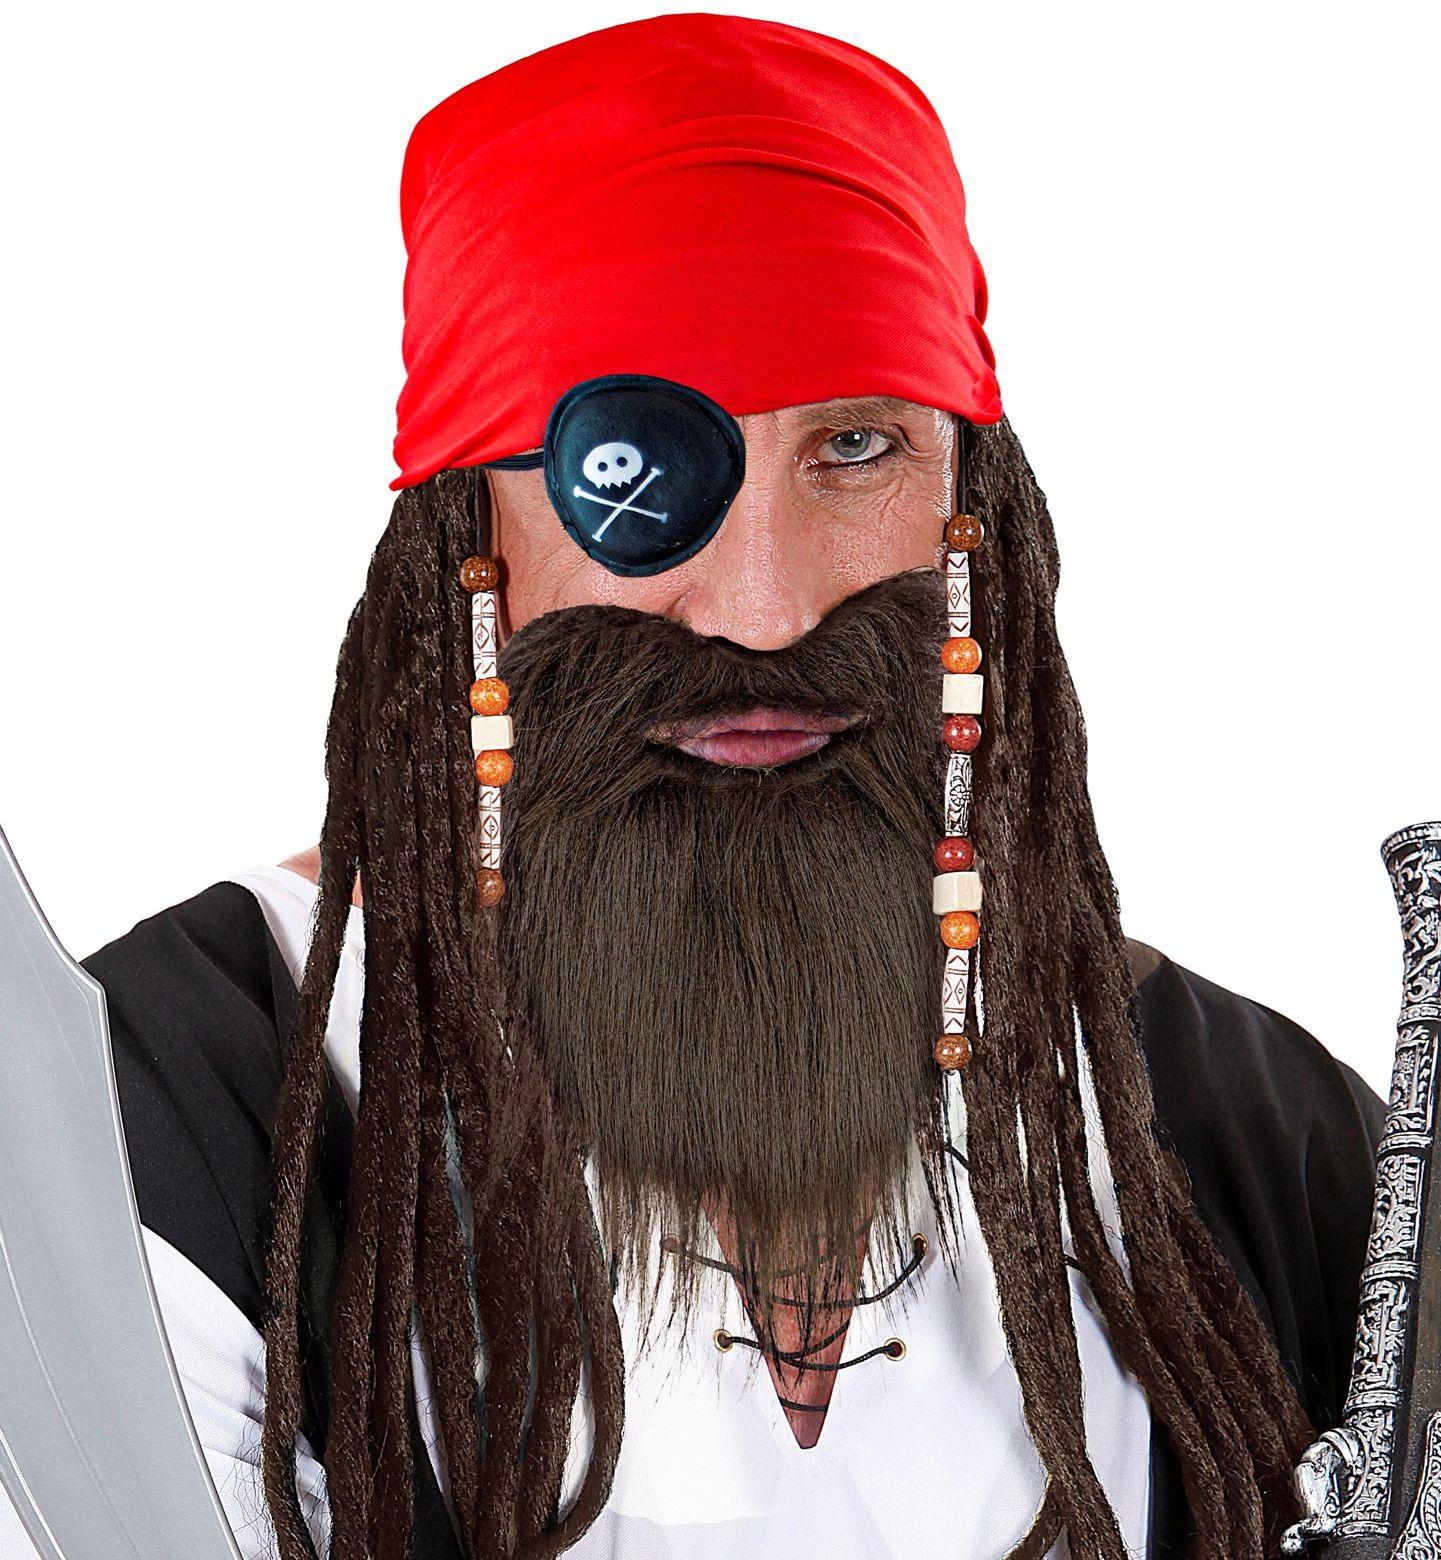 Piraten bandana, ooglapje en baard